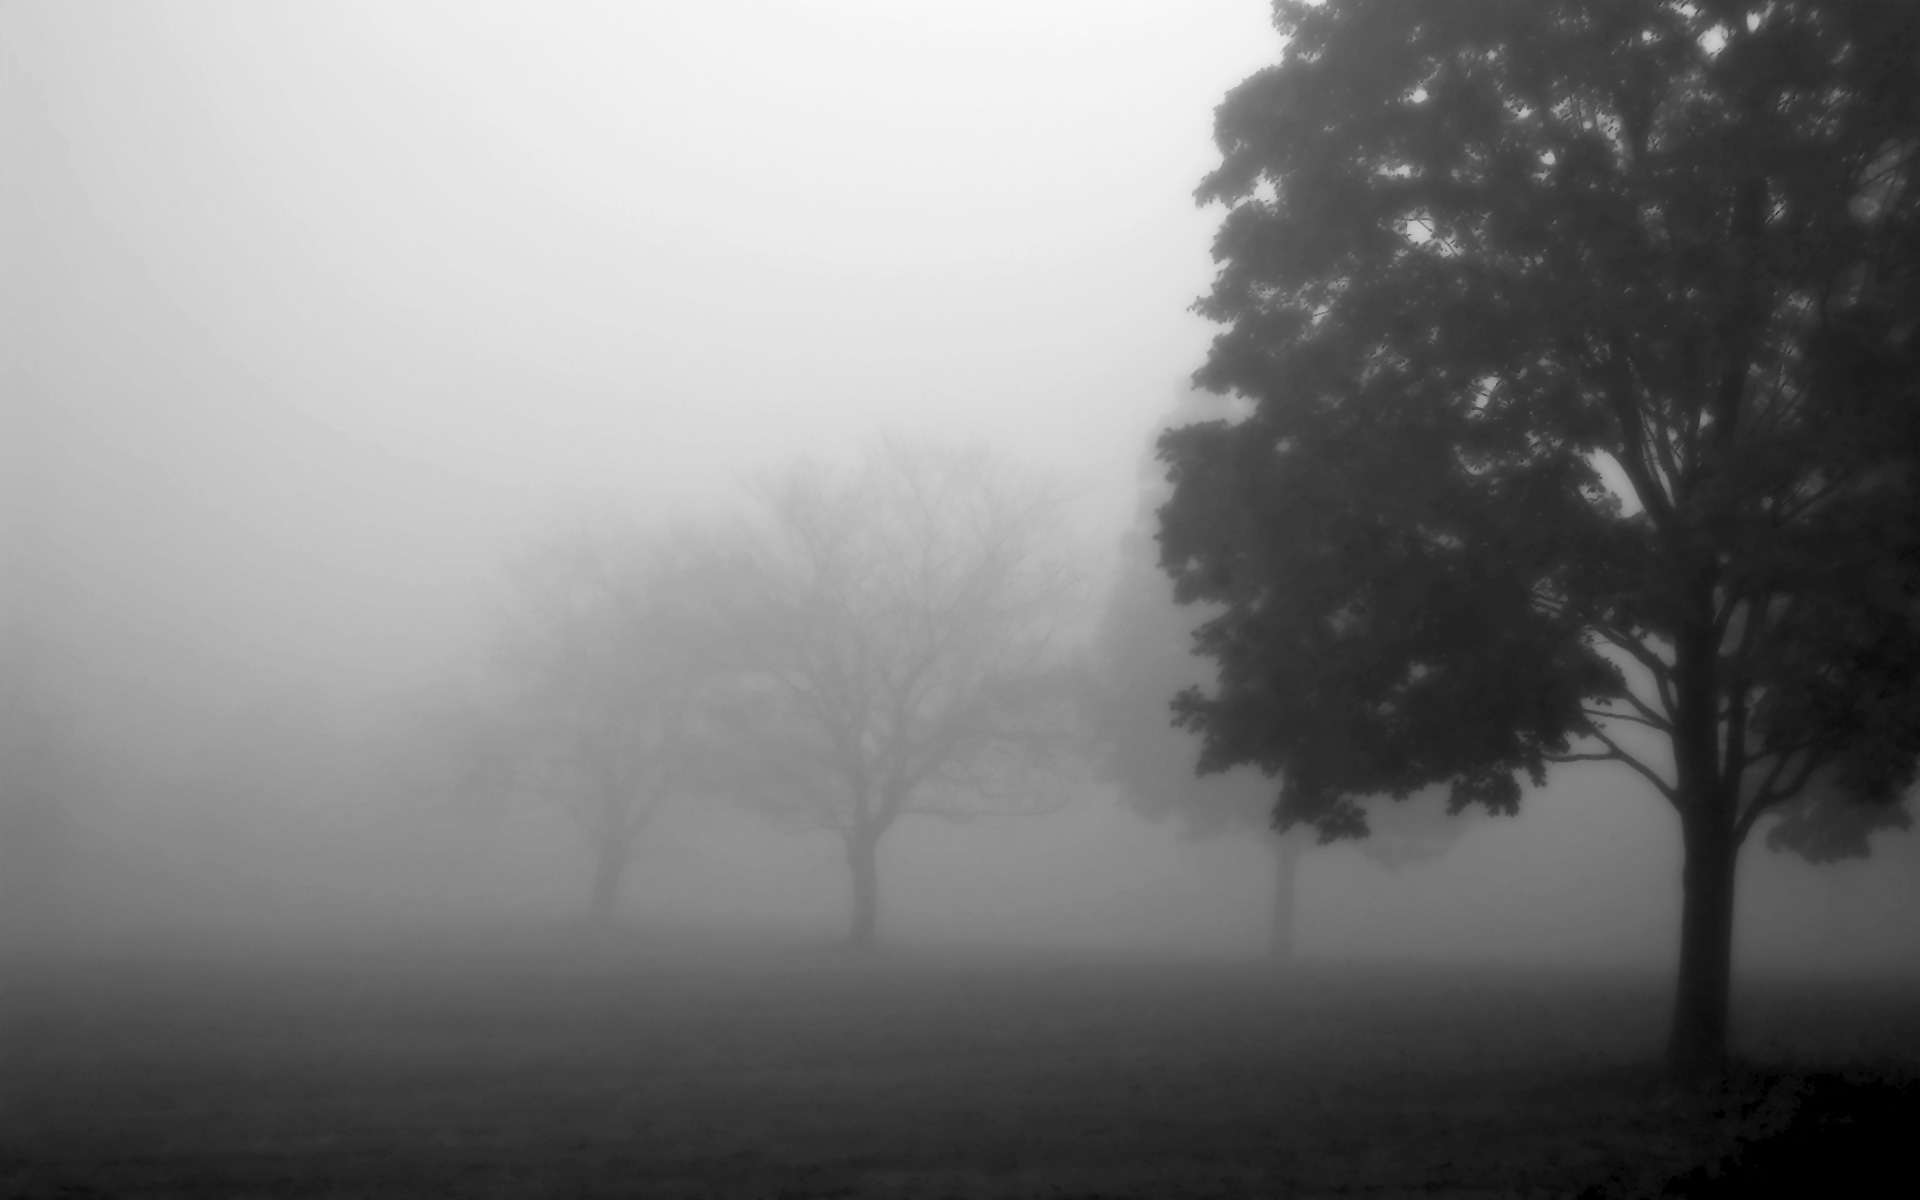 Mist clipart black and white #2